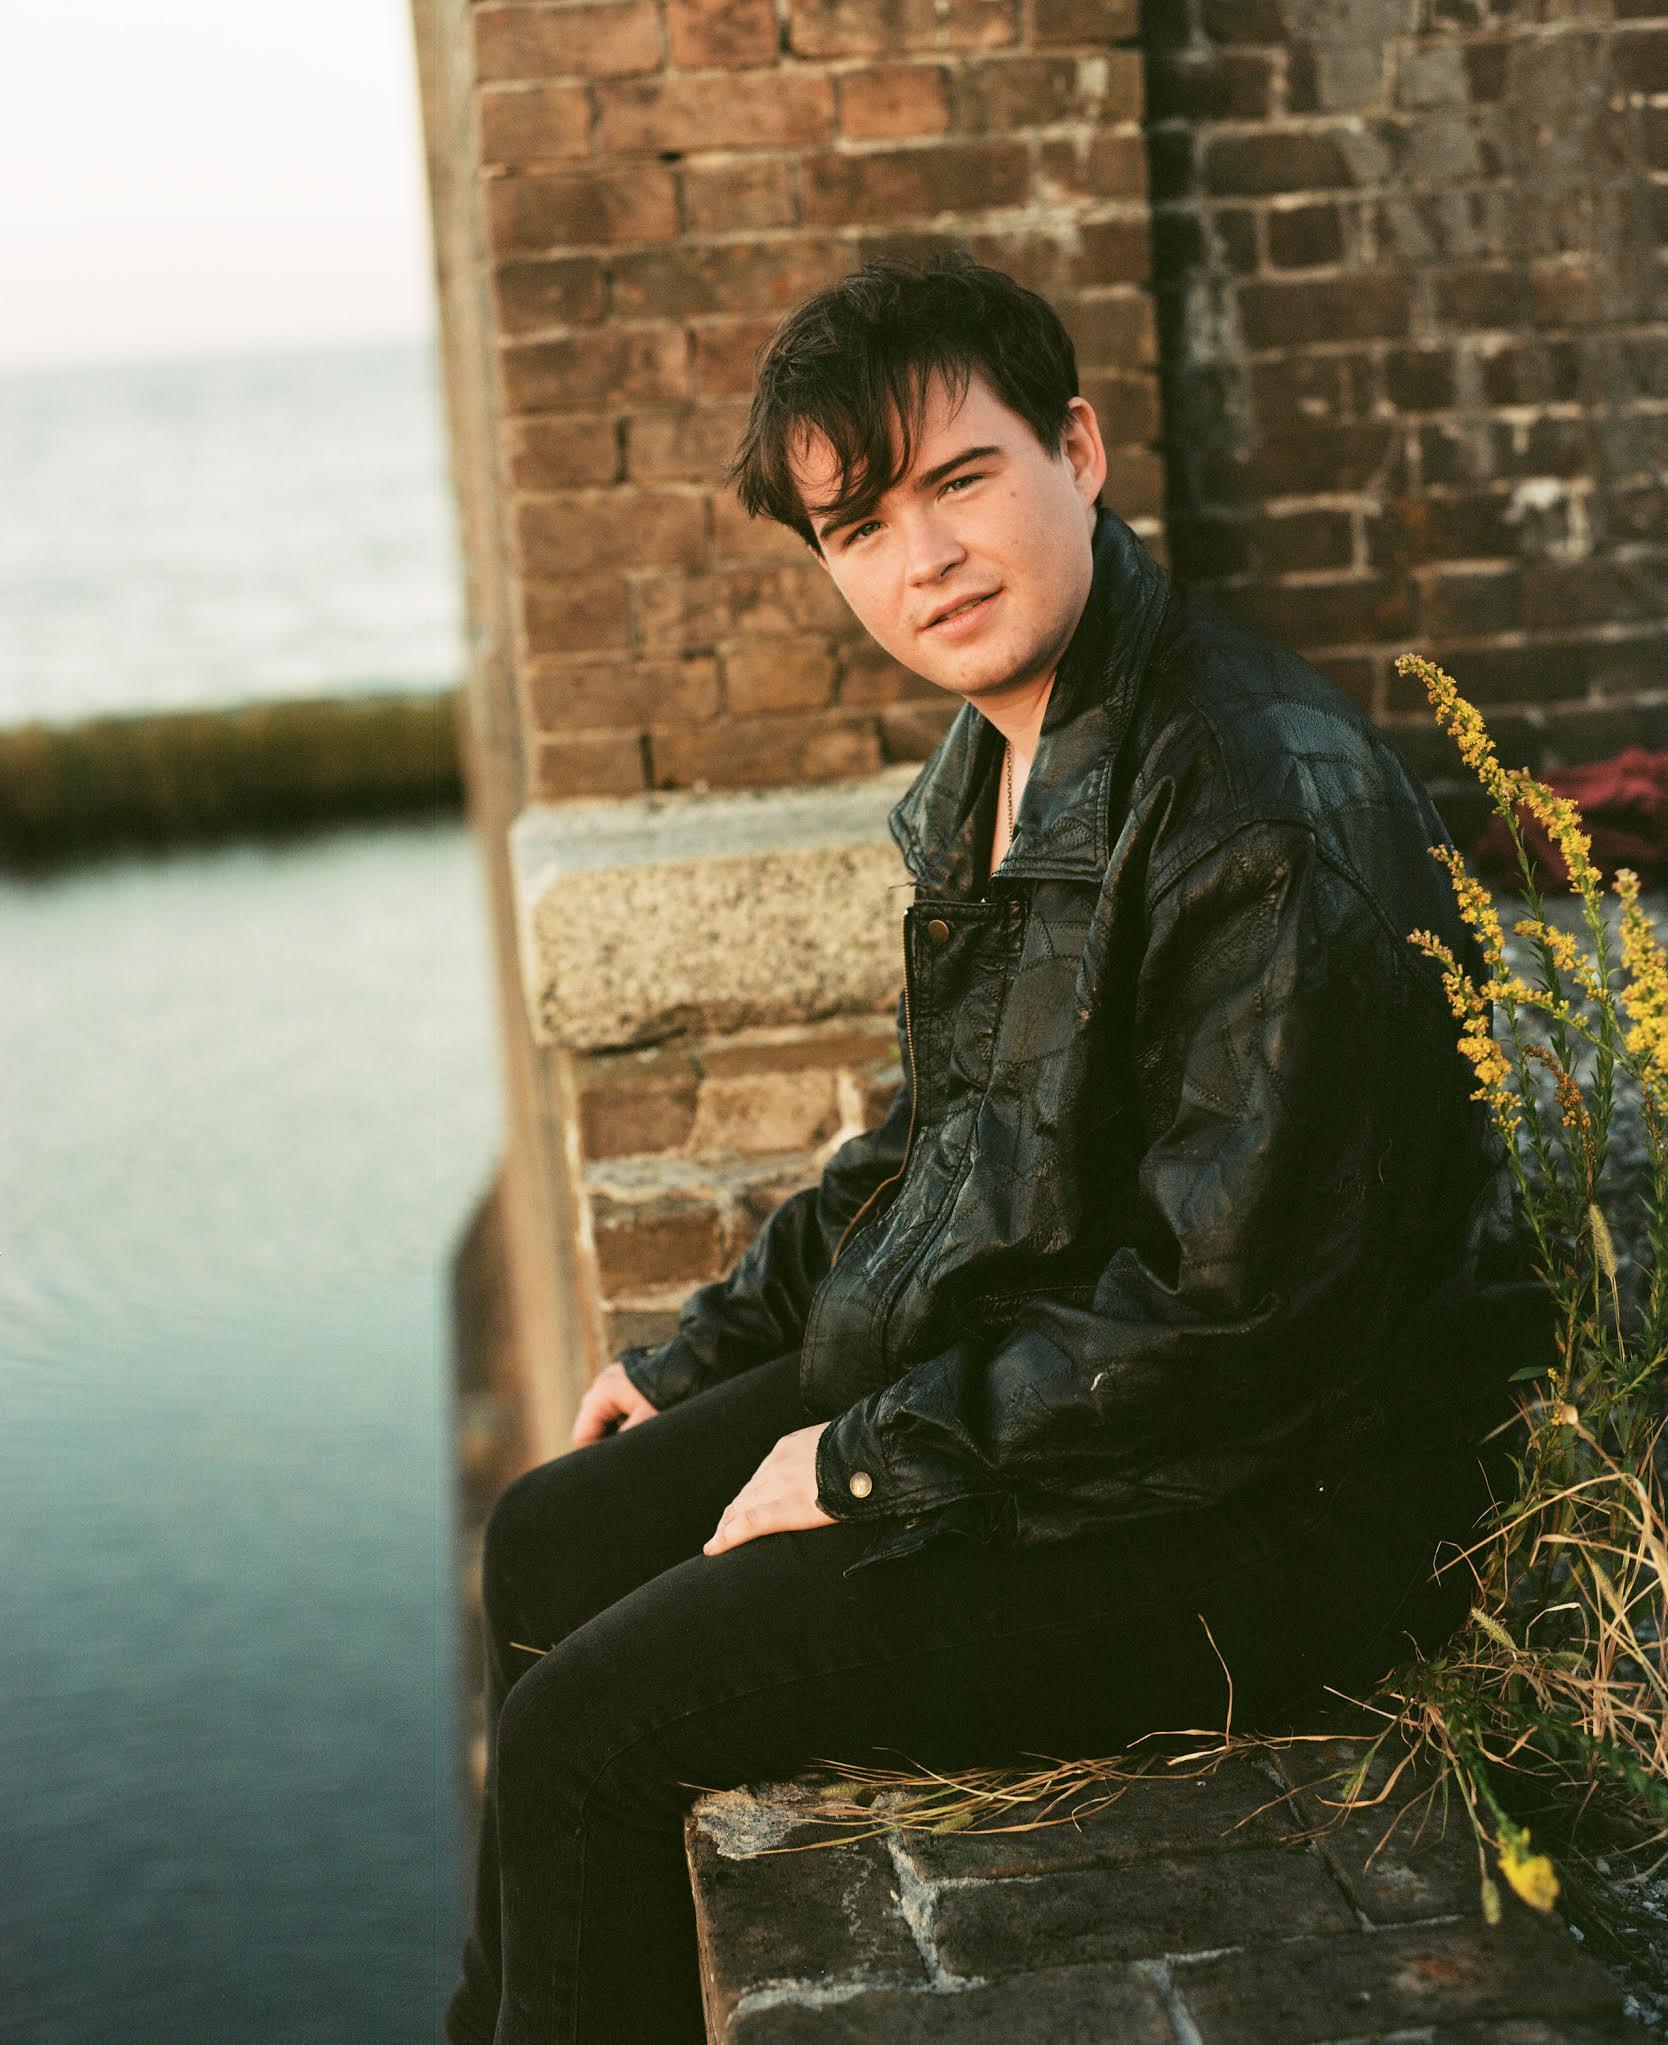 Photo of Stephen Ira by Chris Berntsen